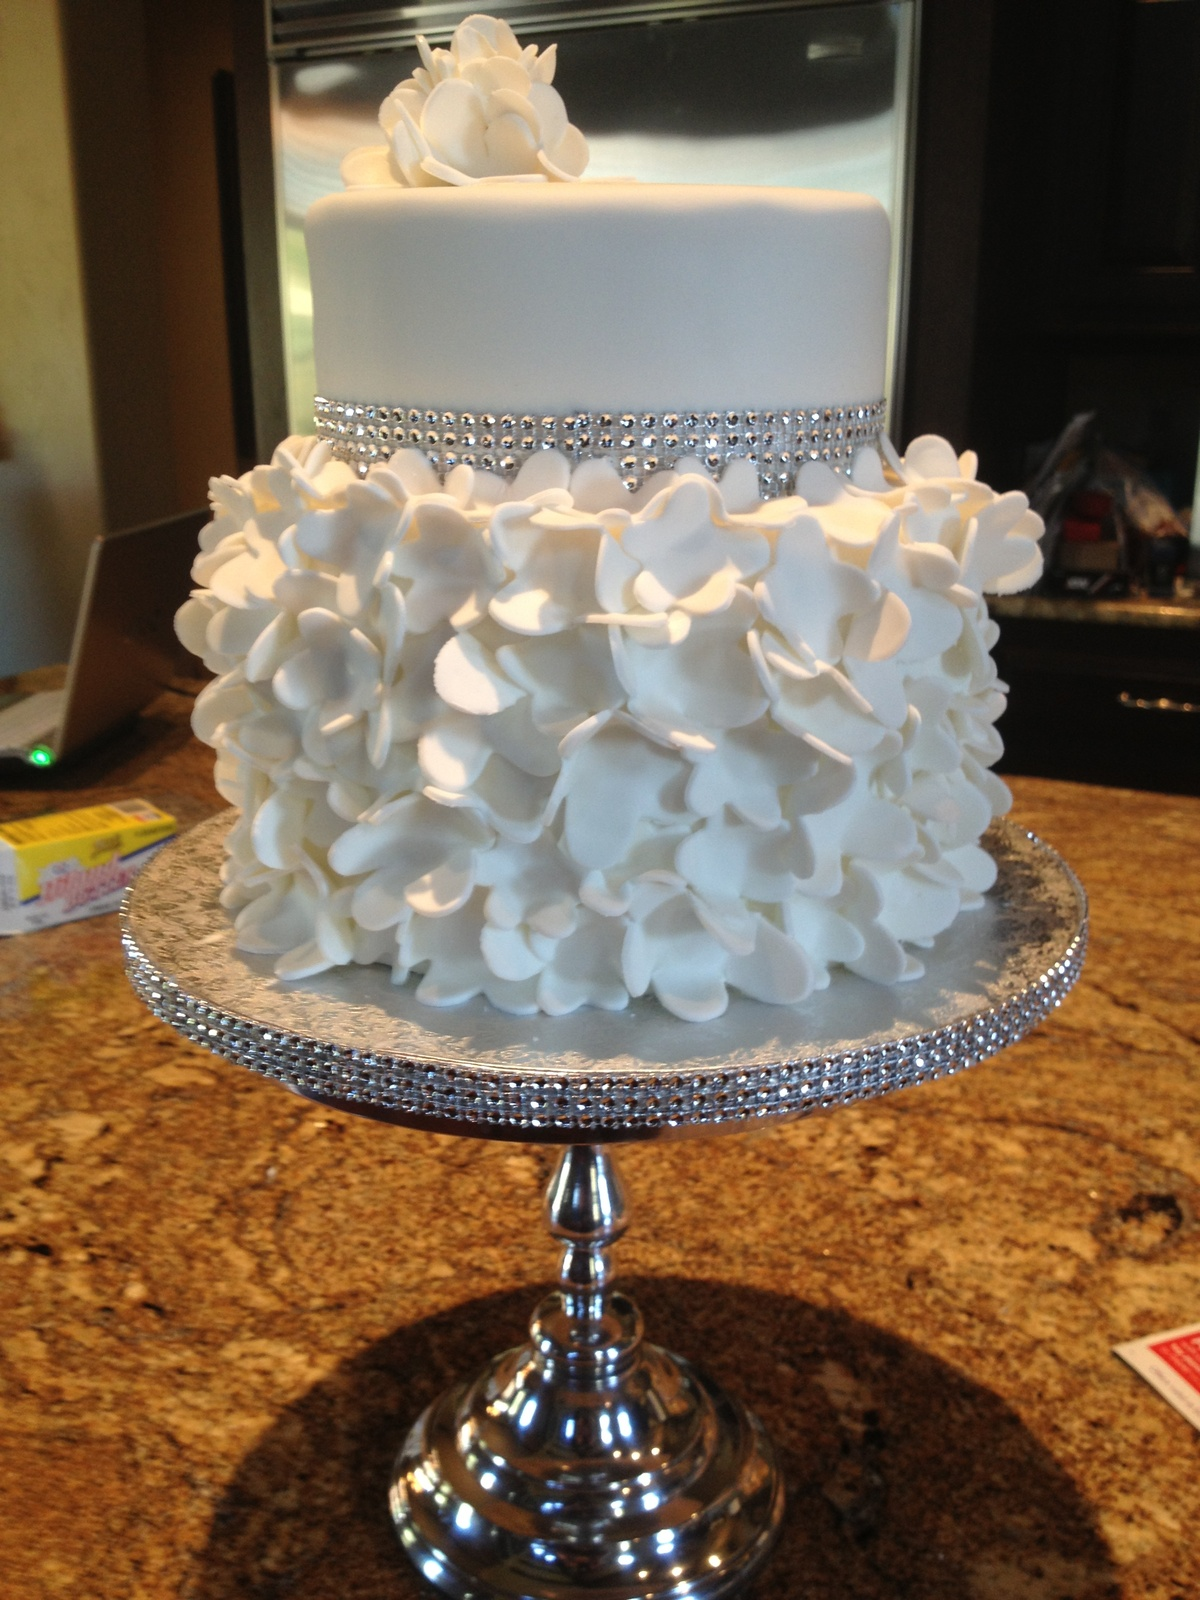 1000 images about Bridal Shower Cake on Pinterest